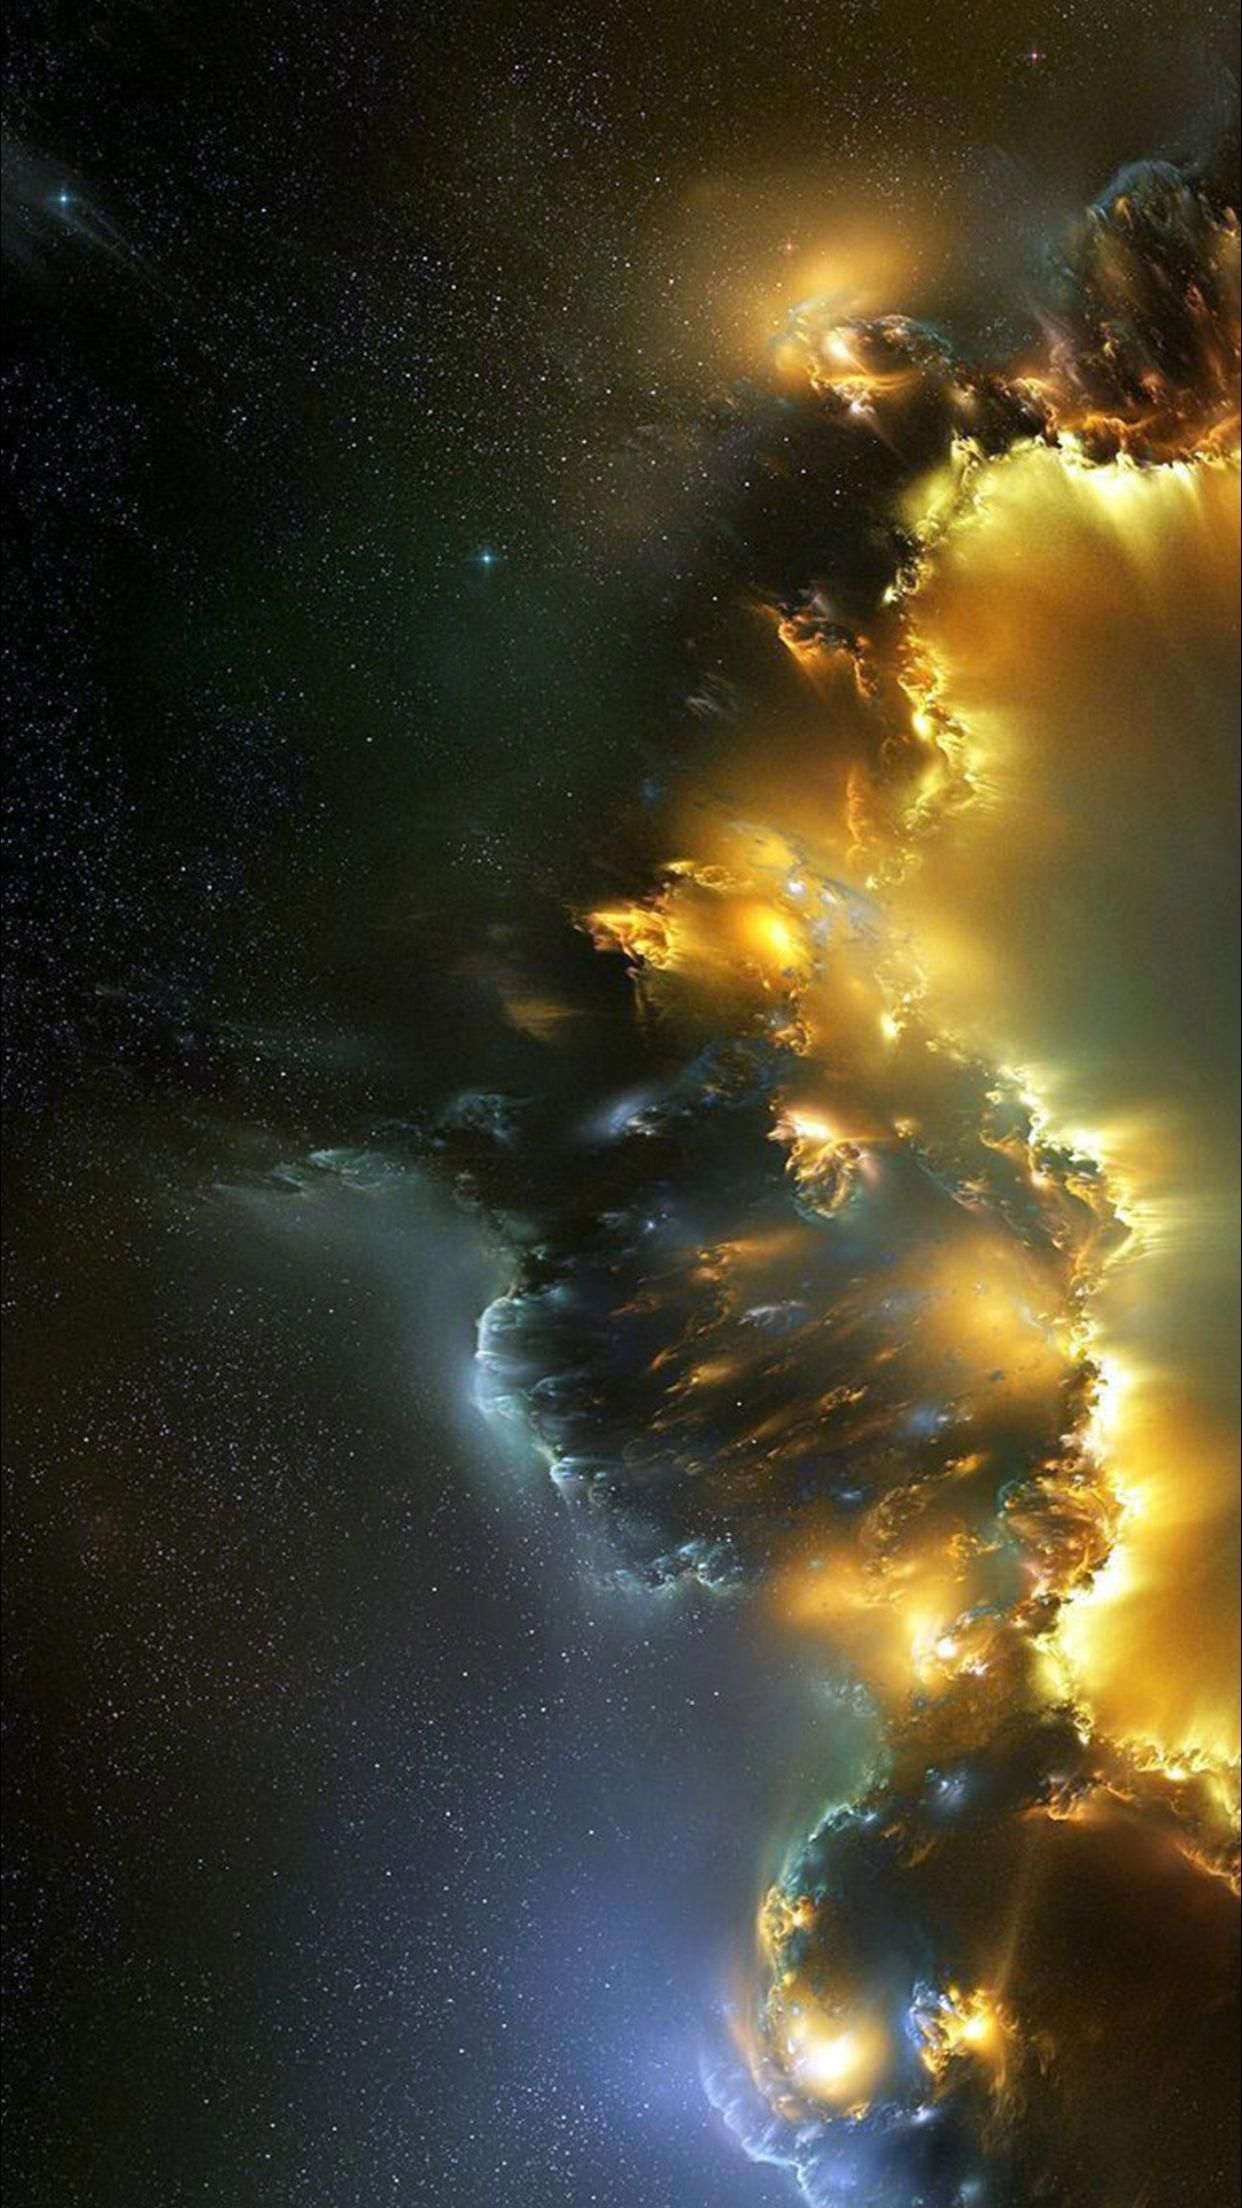 收藏到 stars